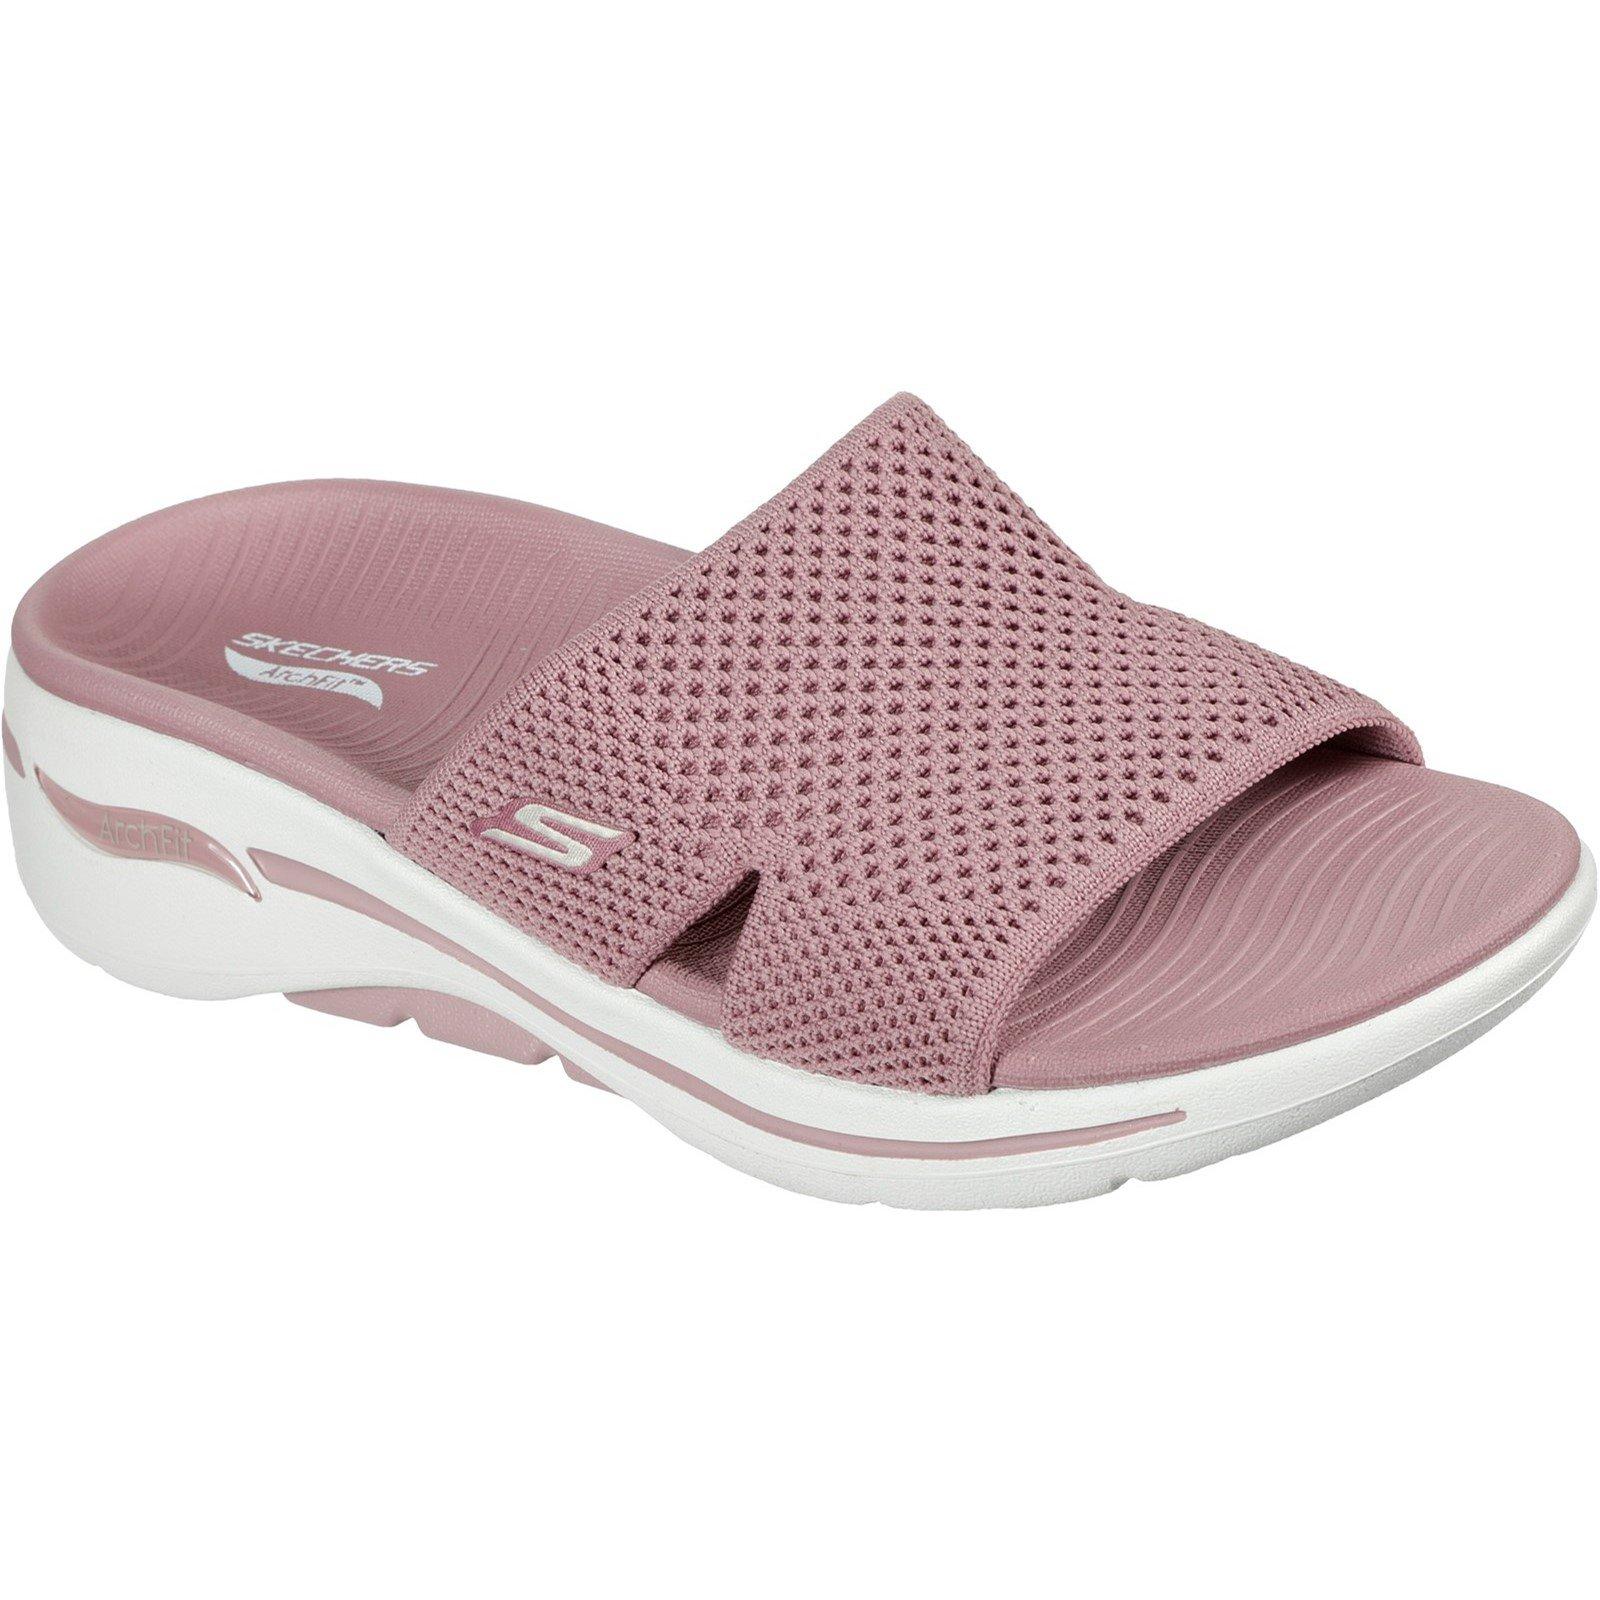 Skechers Women's Go Walk Arch Fit Worthy Summer Sandal Various Colours 32152 - Rose 8